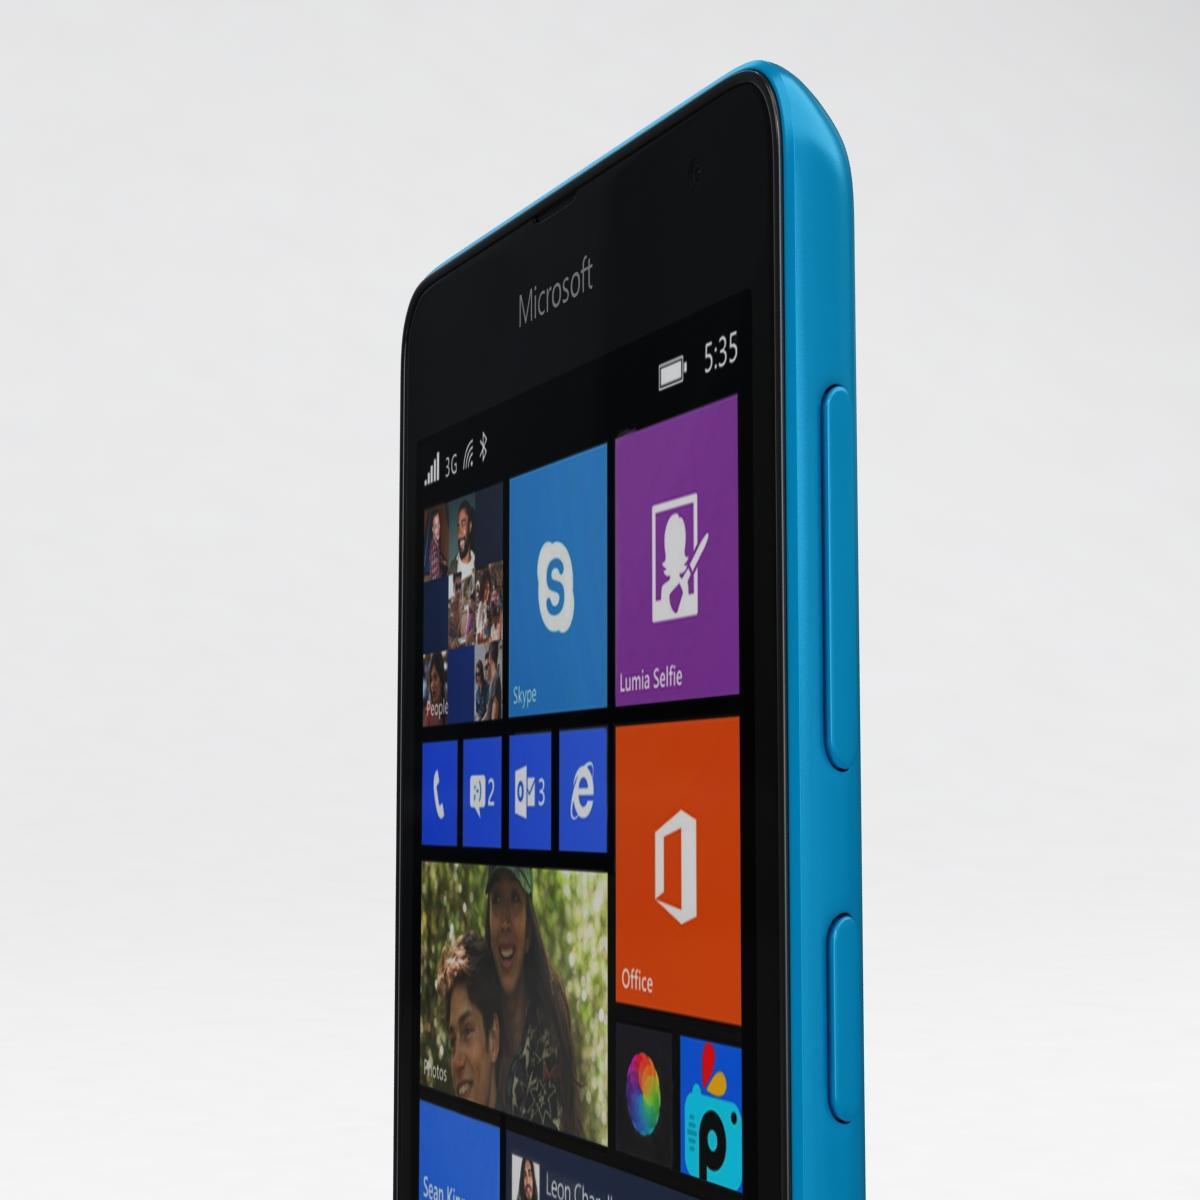 microsoft lumia 535 and dual sim blue 3d model 3ds max fbx c4d obj 204531